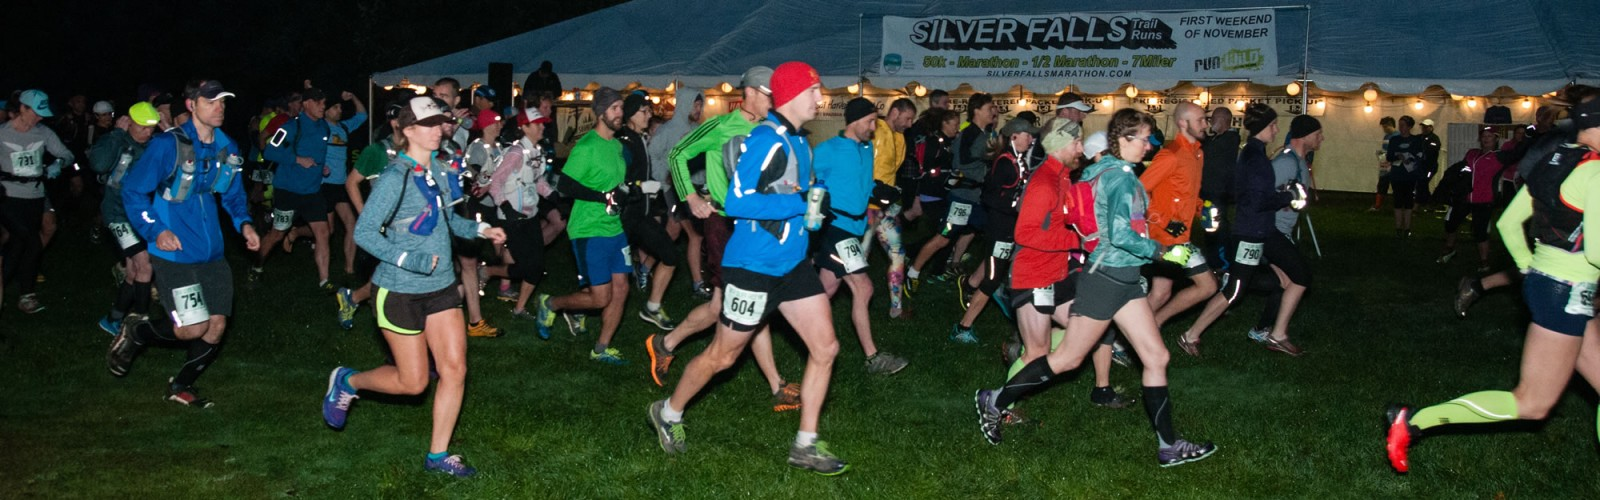 Silver Falls Marathon